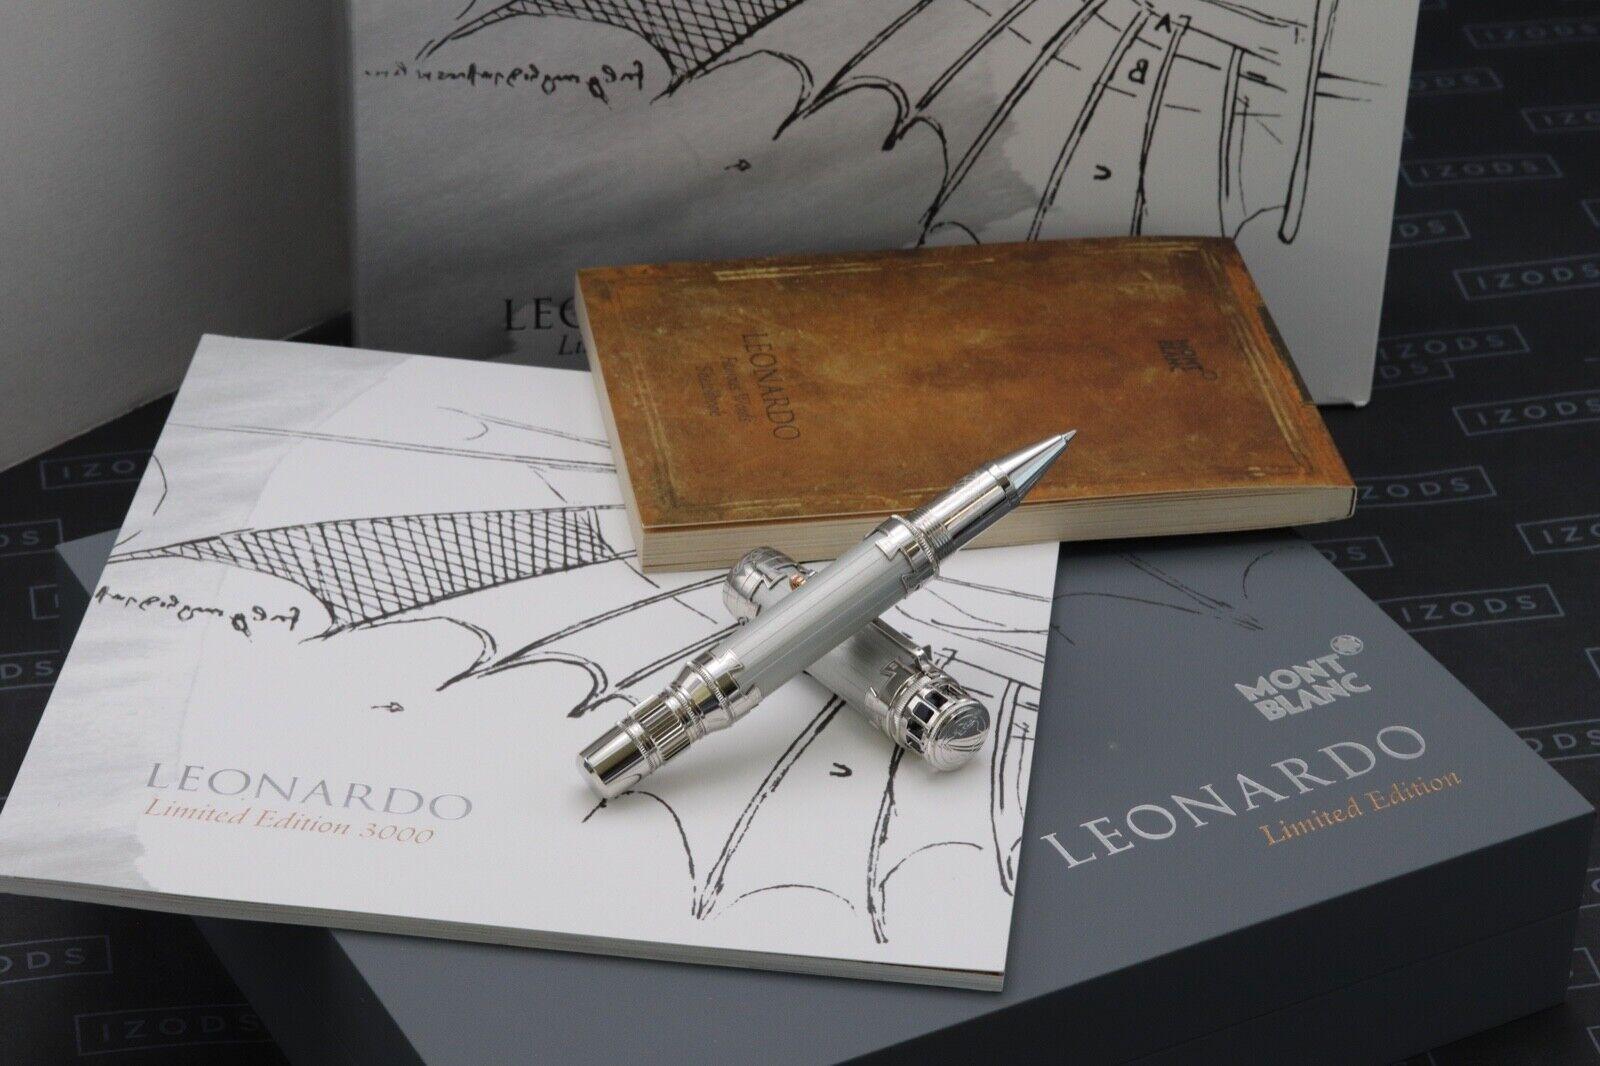 Montblanc Leonardo da Vinci Limited Edition 3000 Rollerball Pen - UNUSED